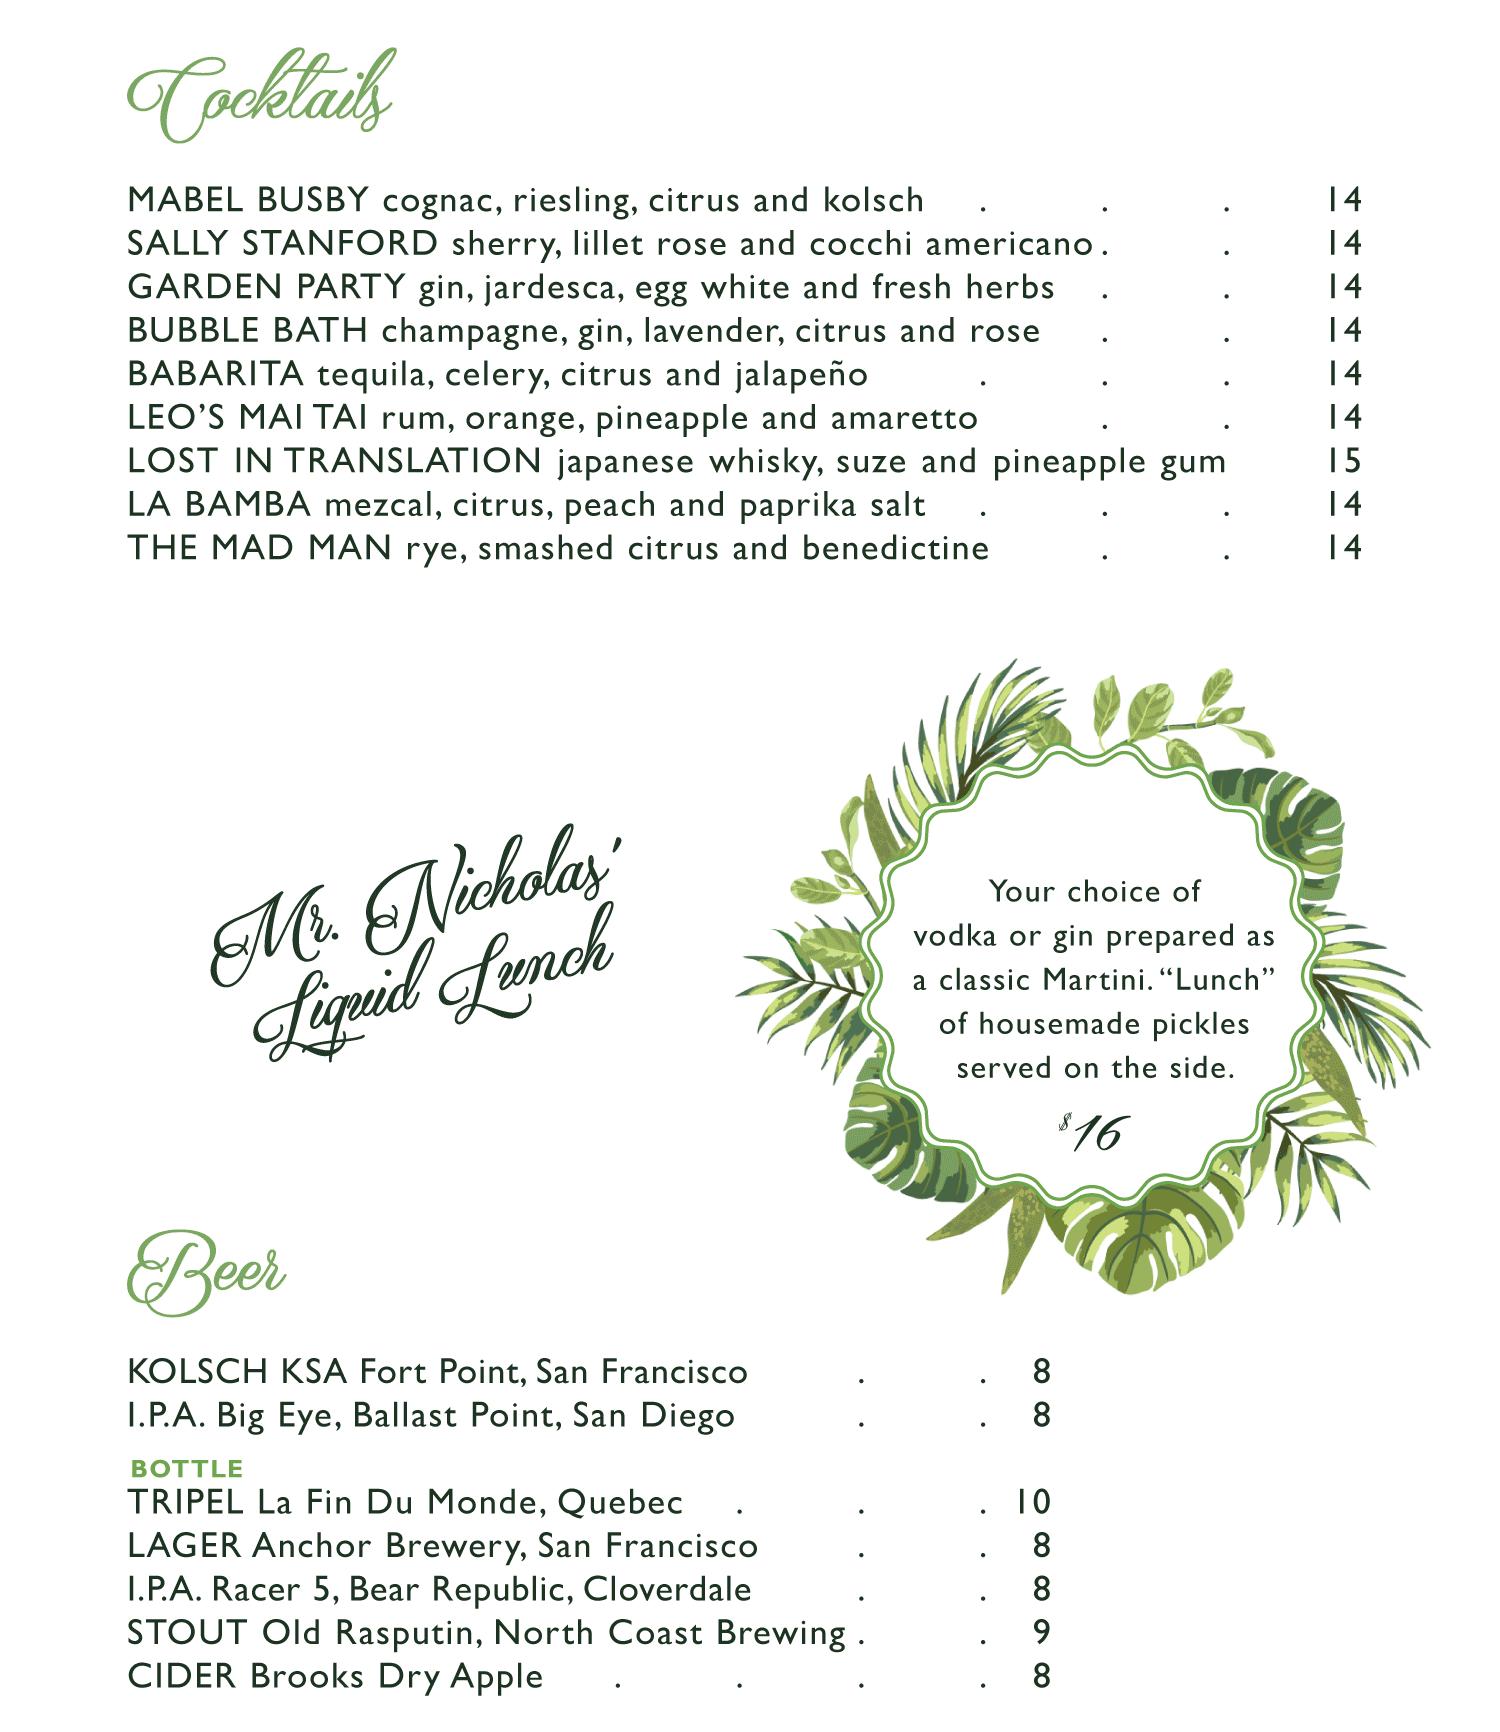 Cocktails-6.26.17